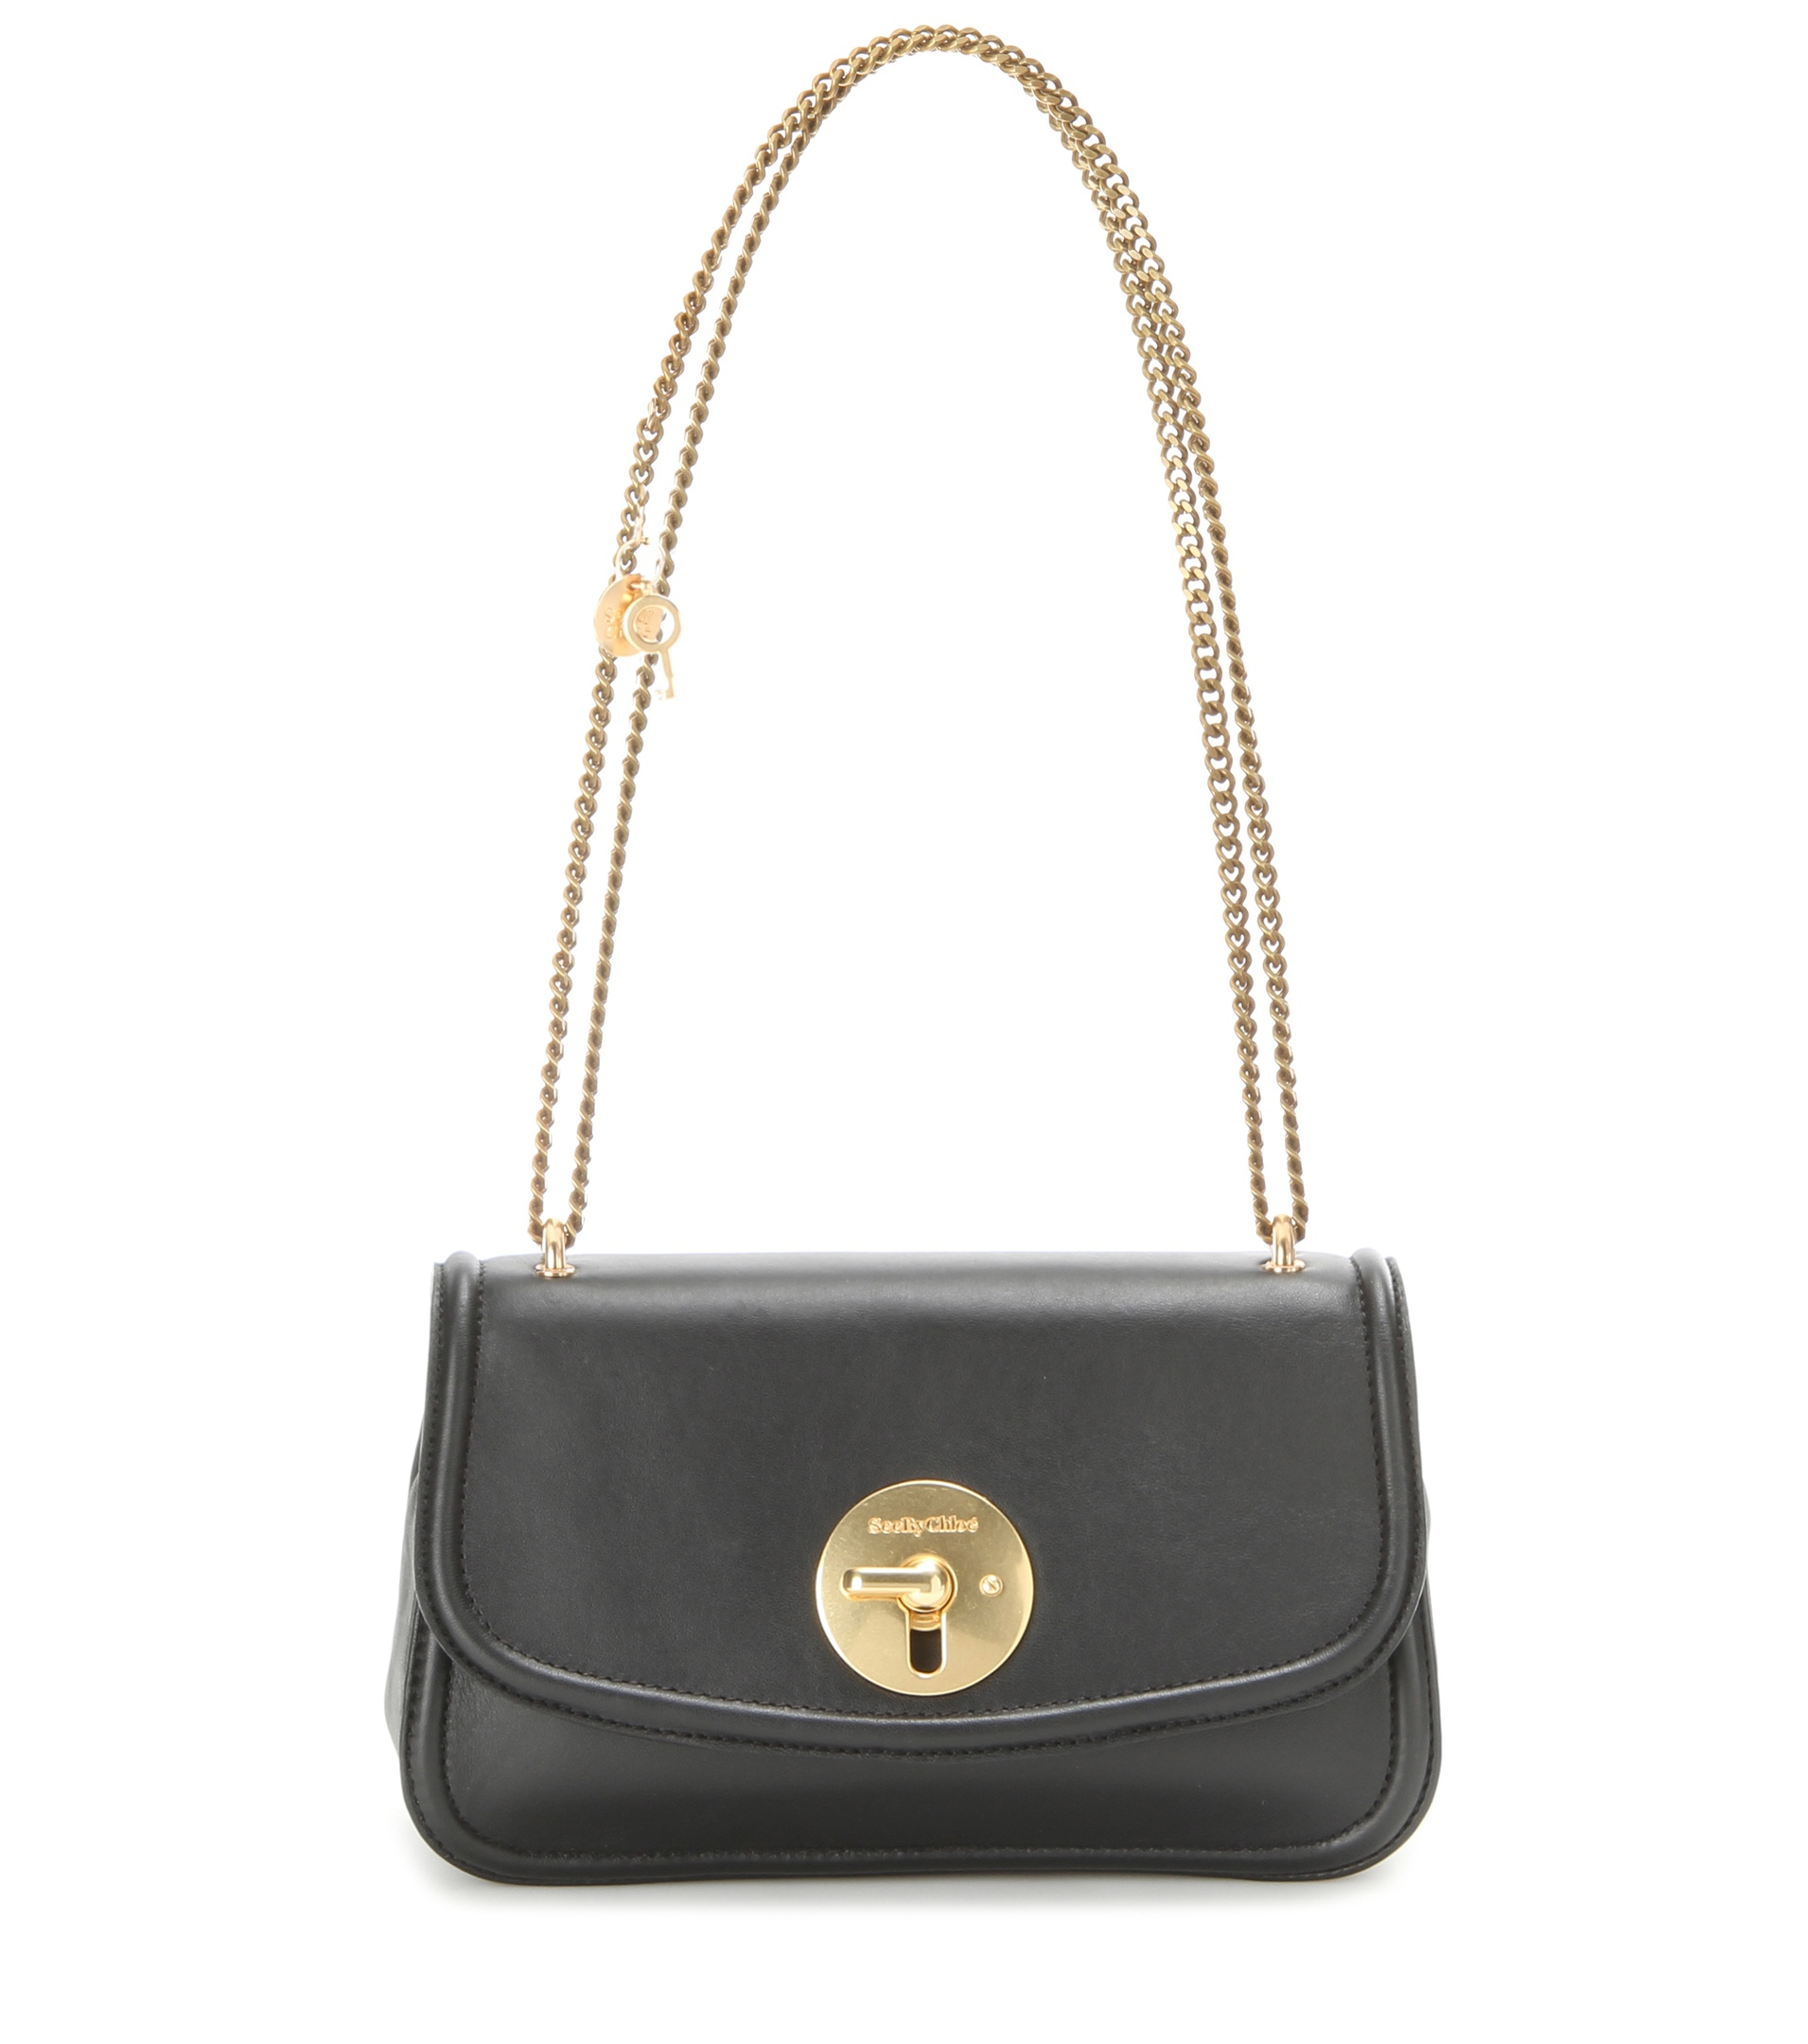 Lois leather shoulder bag See By Chlo bcqih